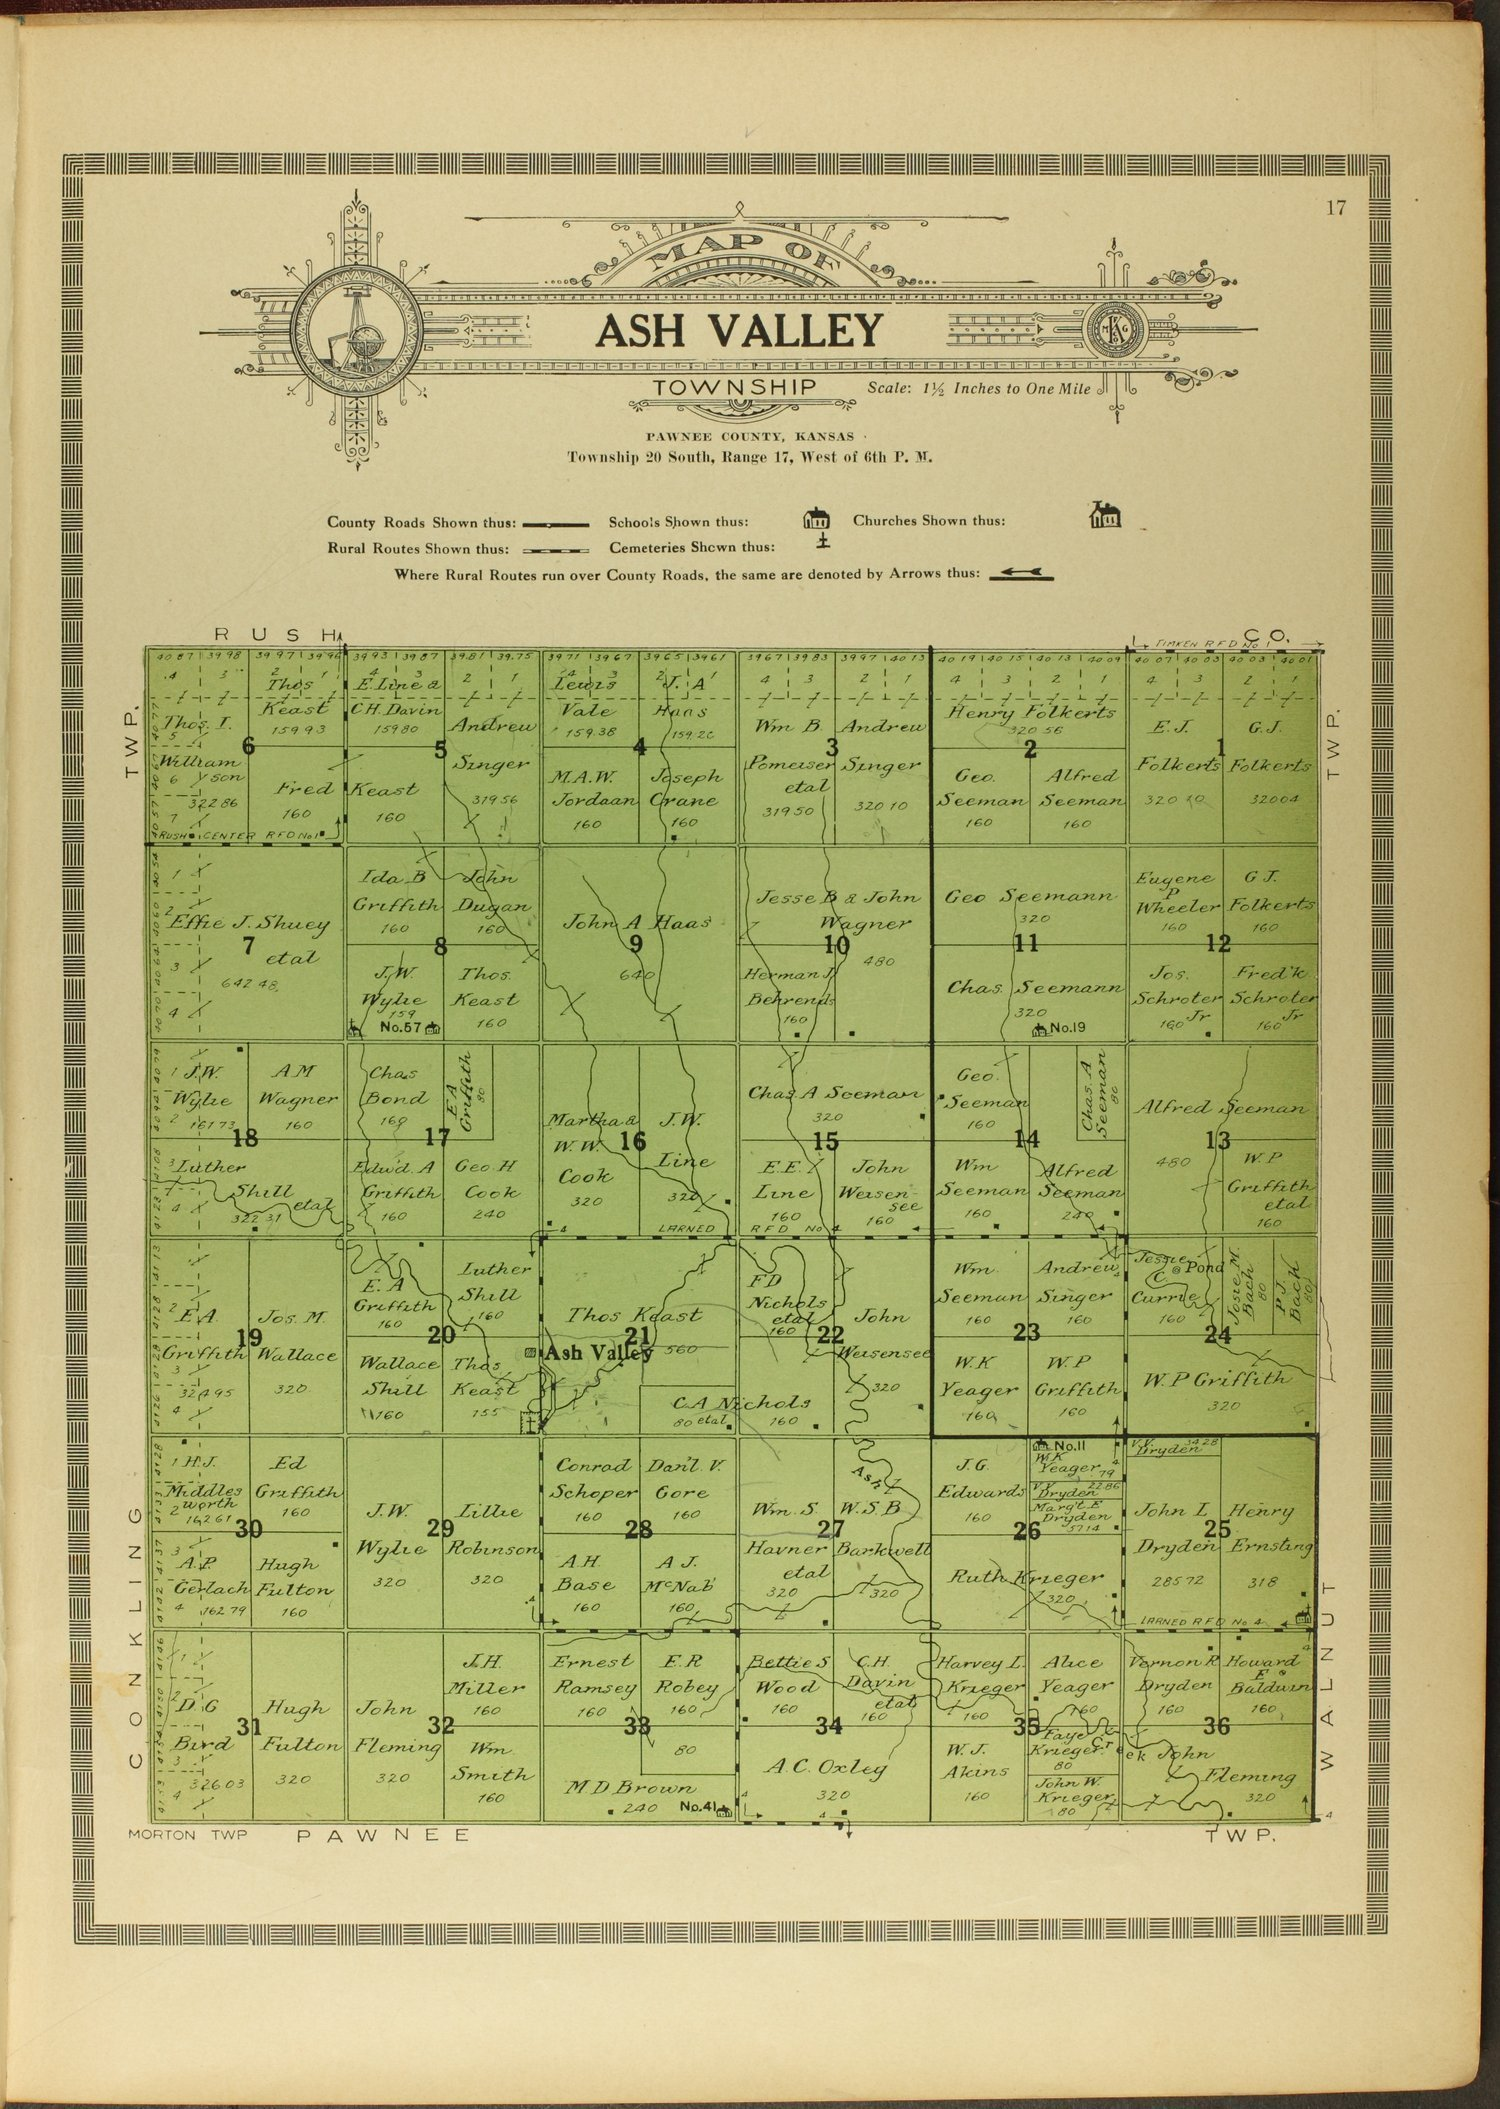 Atlas and plat book of Pawnee County, Kansas - 17